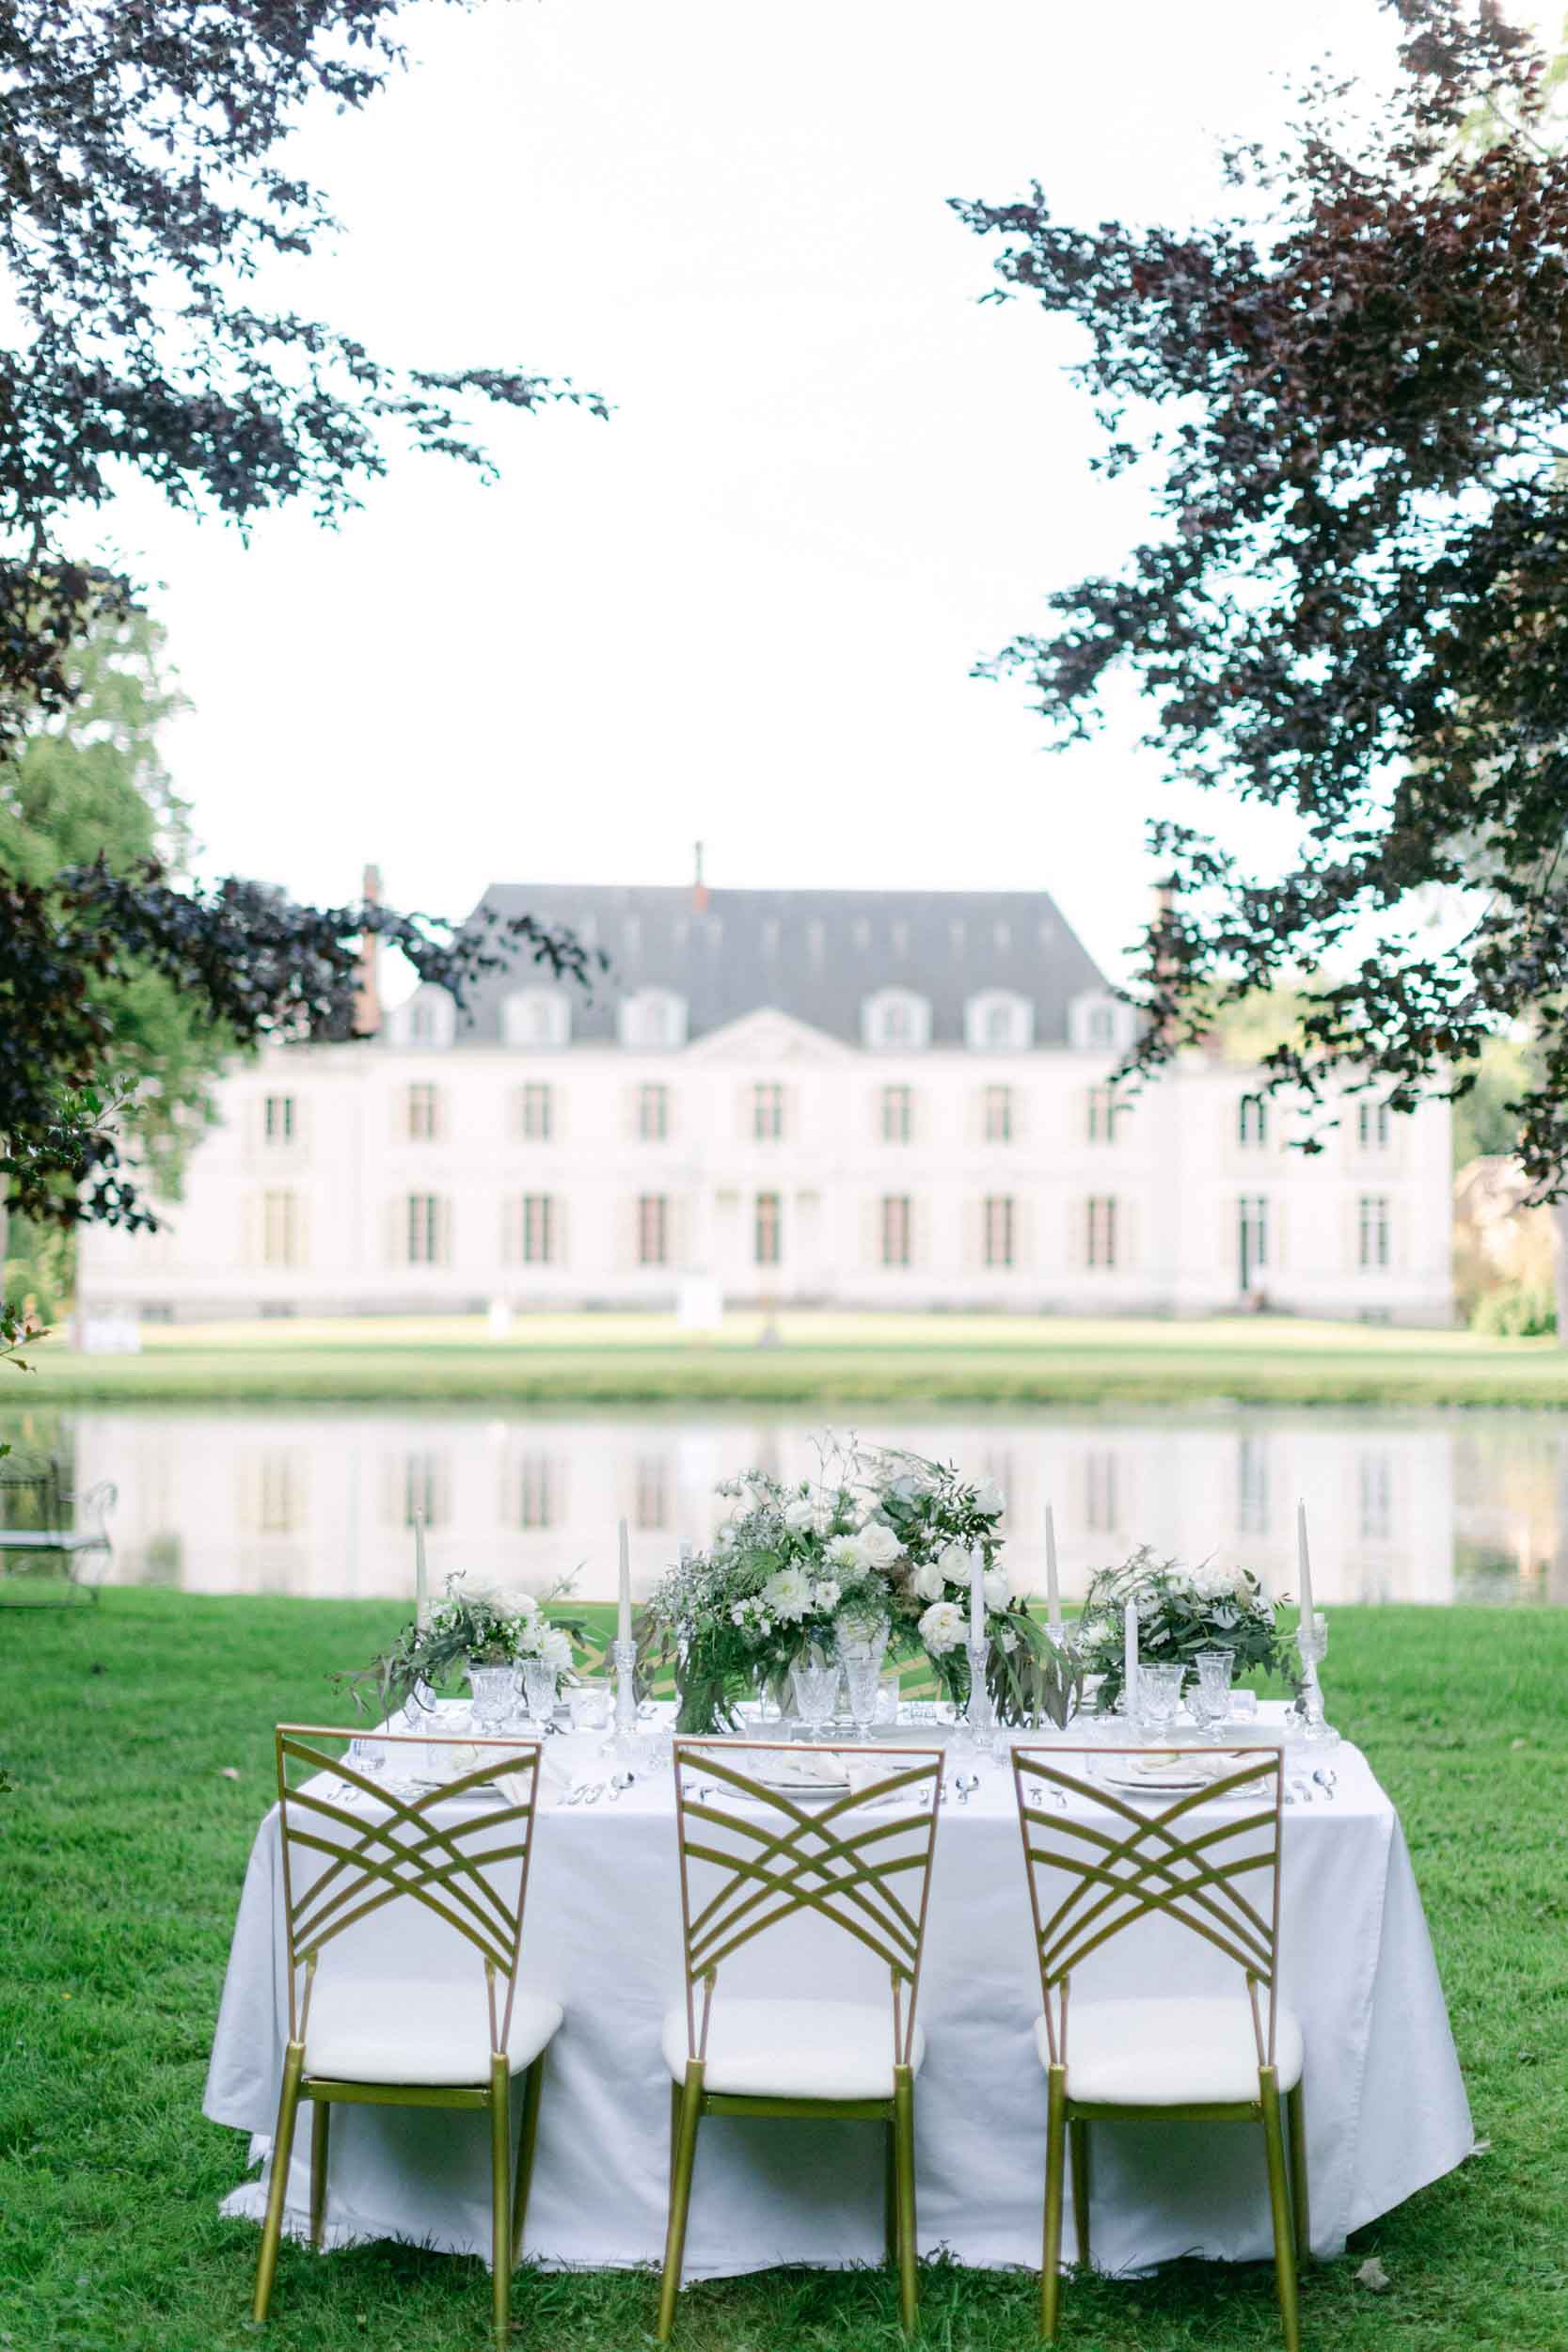 FLORA & HANS-Château Barthélemy